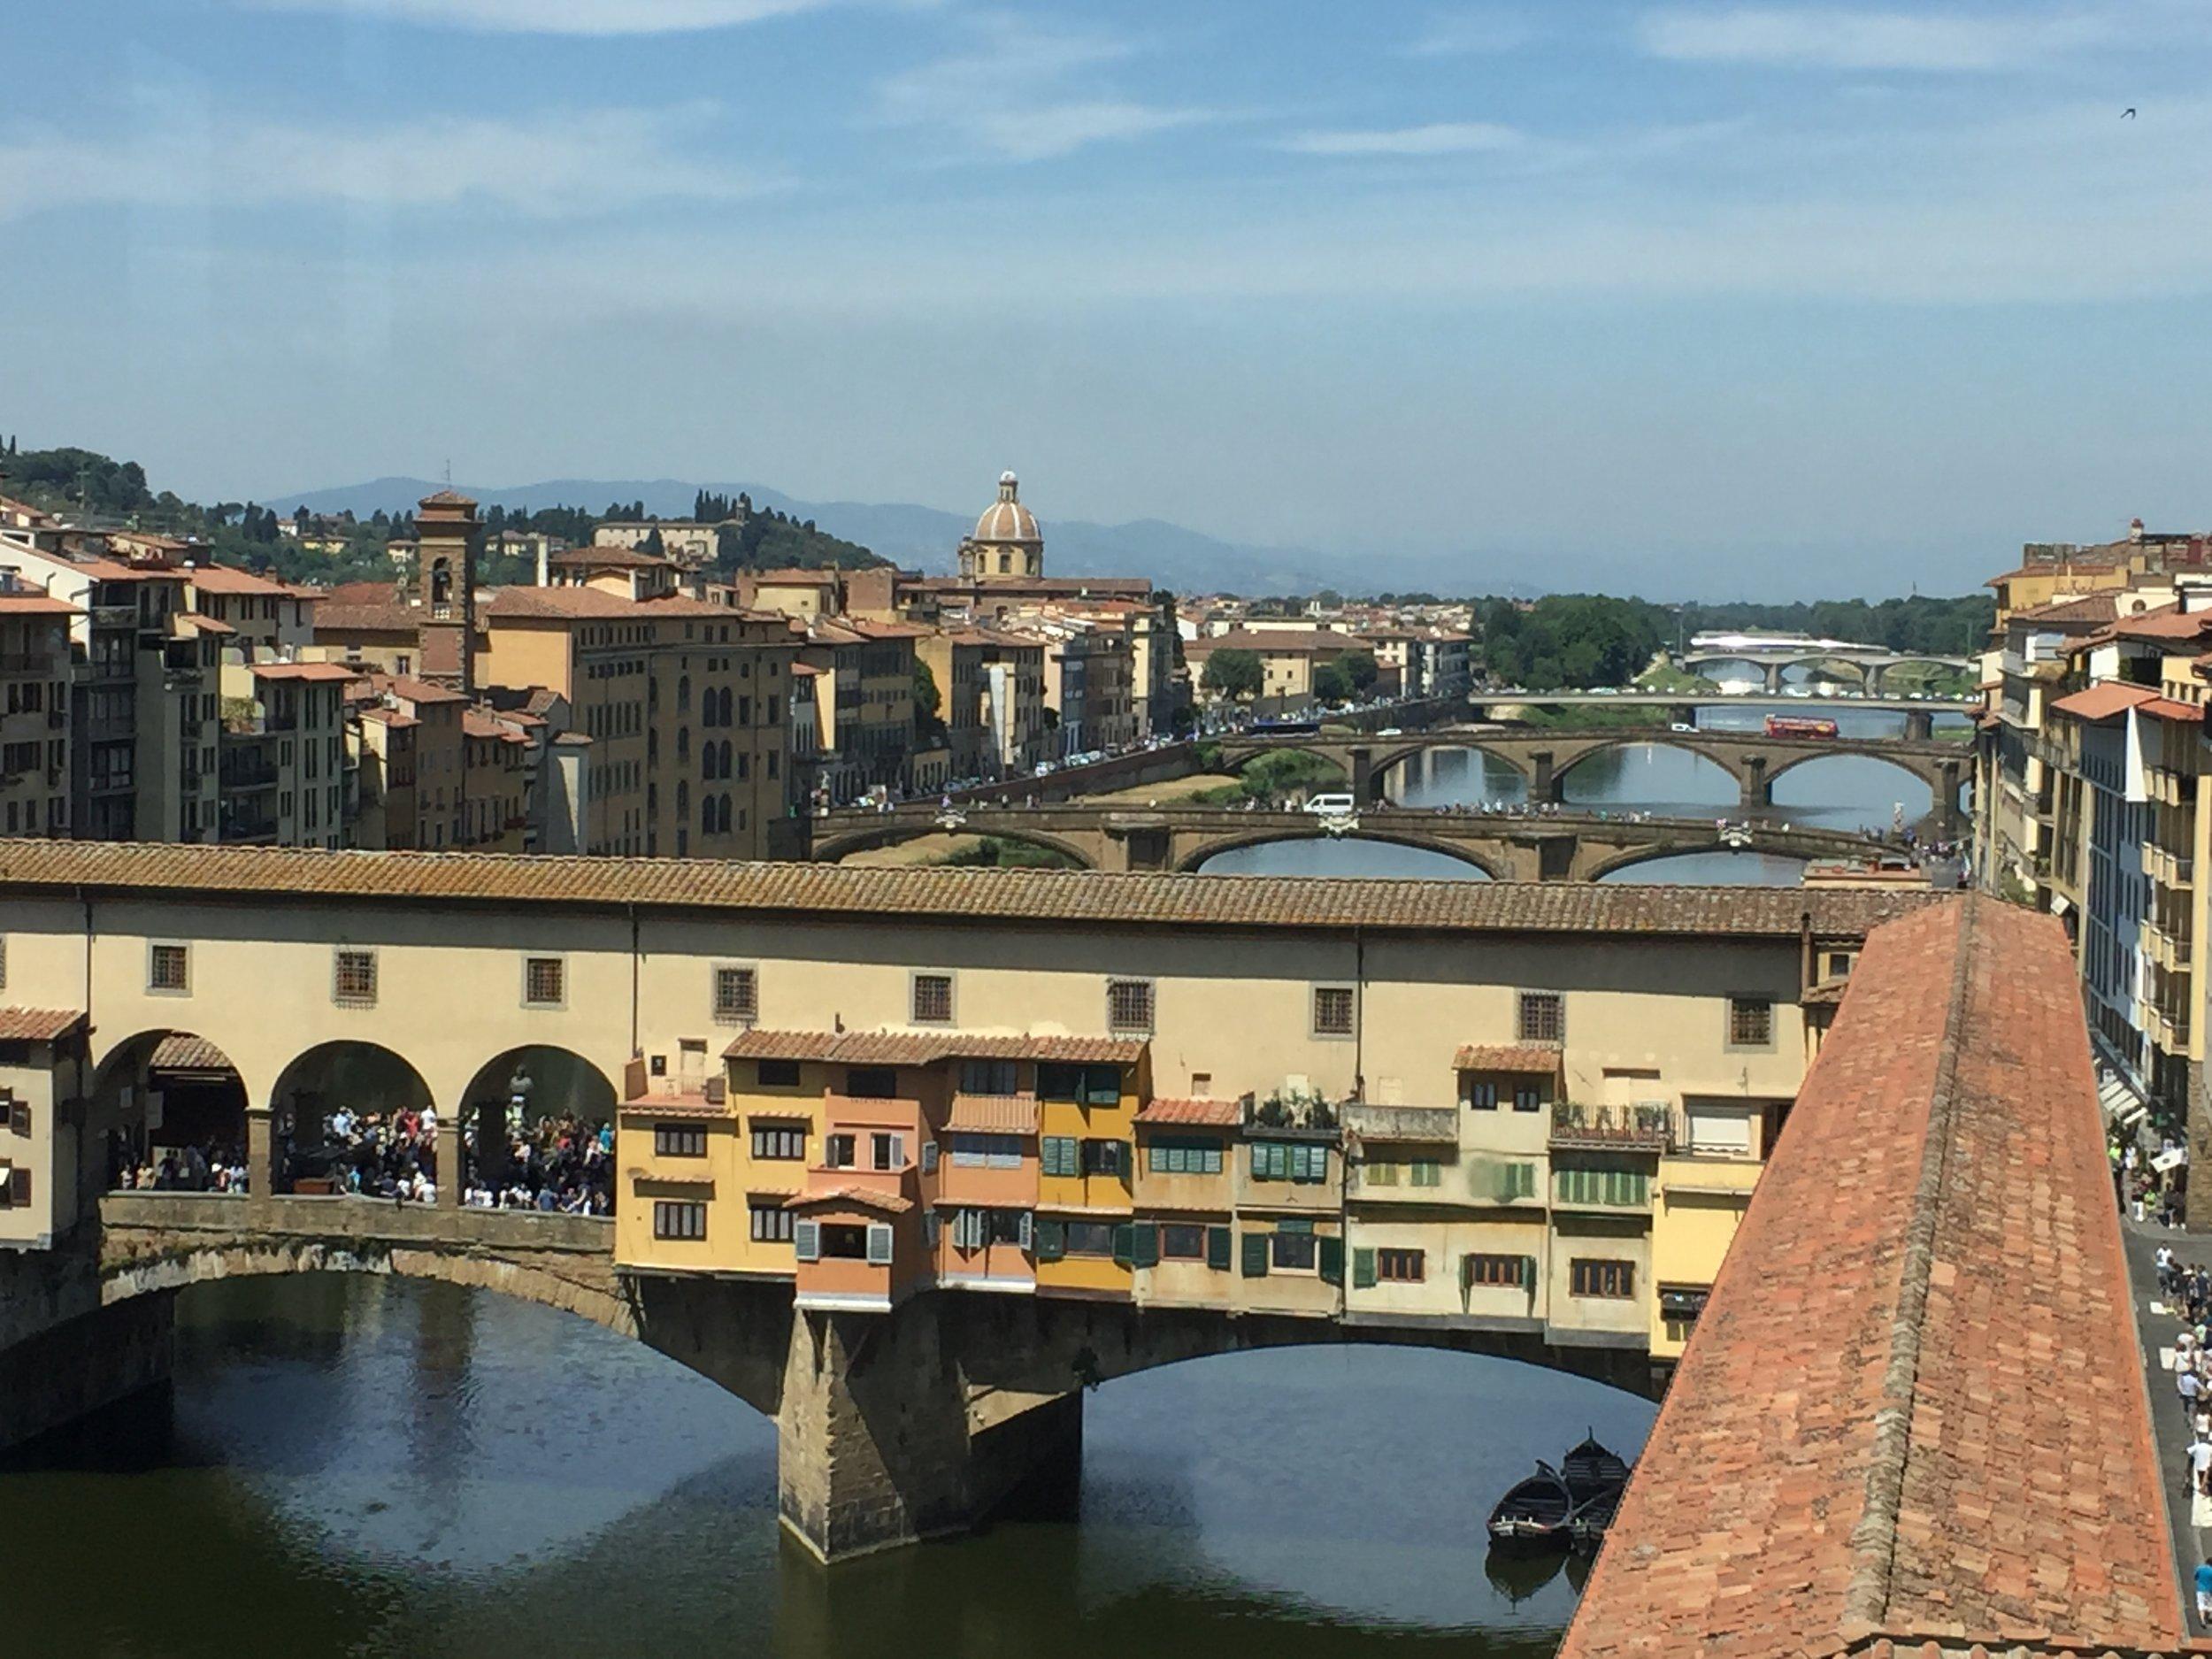 View from the Uffizi museum